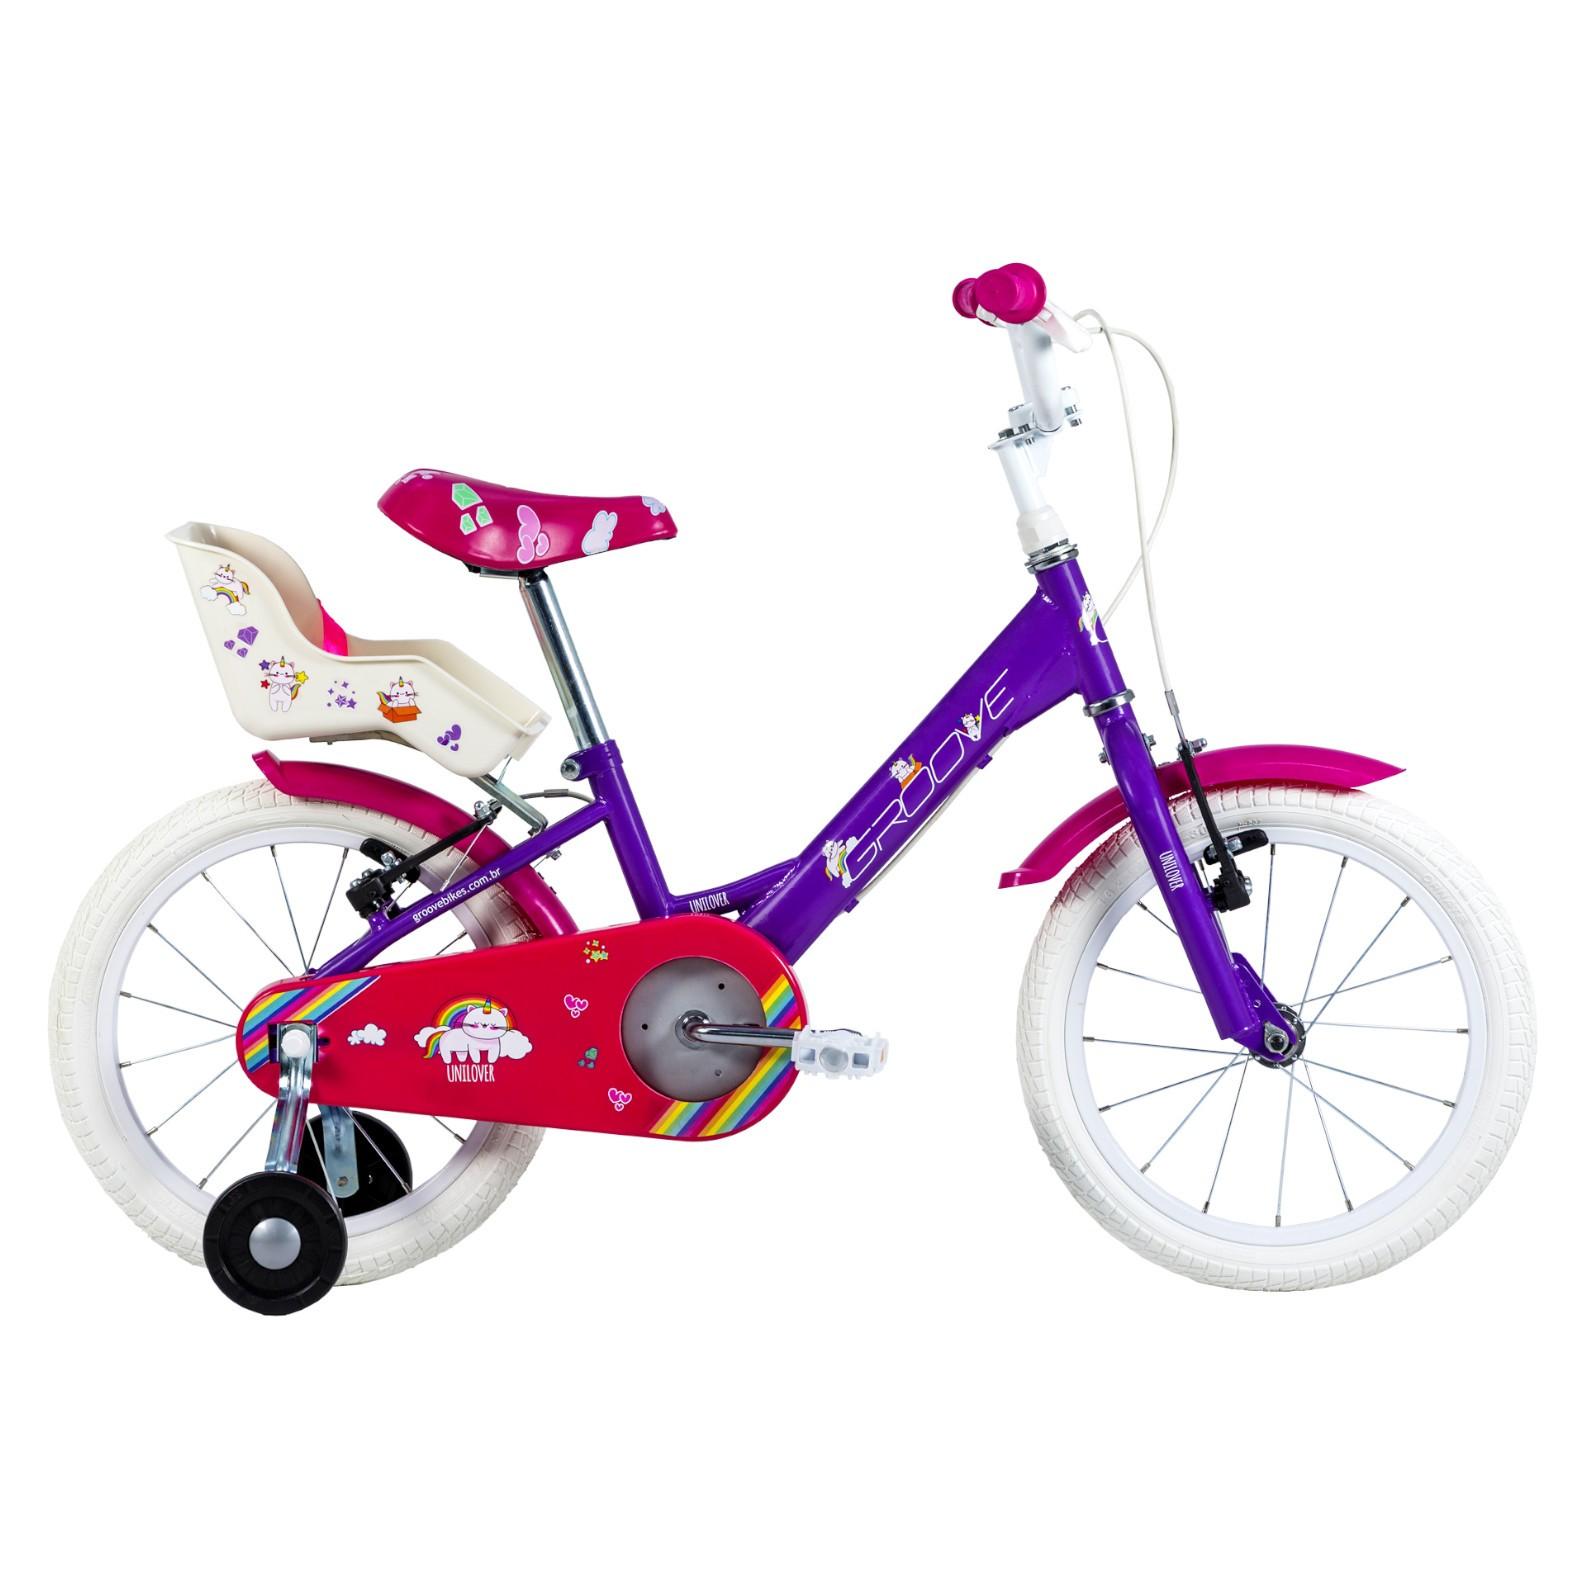 Bicicleta Infantil Groove Unilover Aro 16 2021